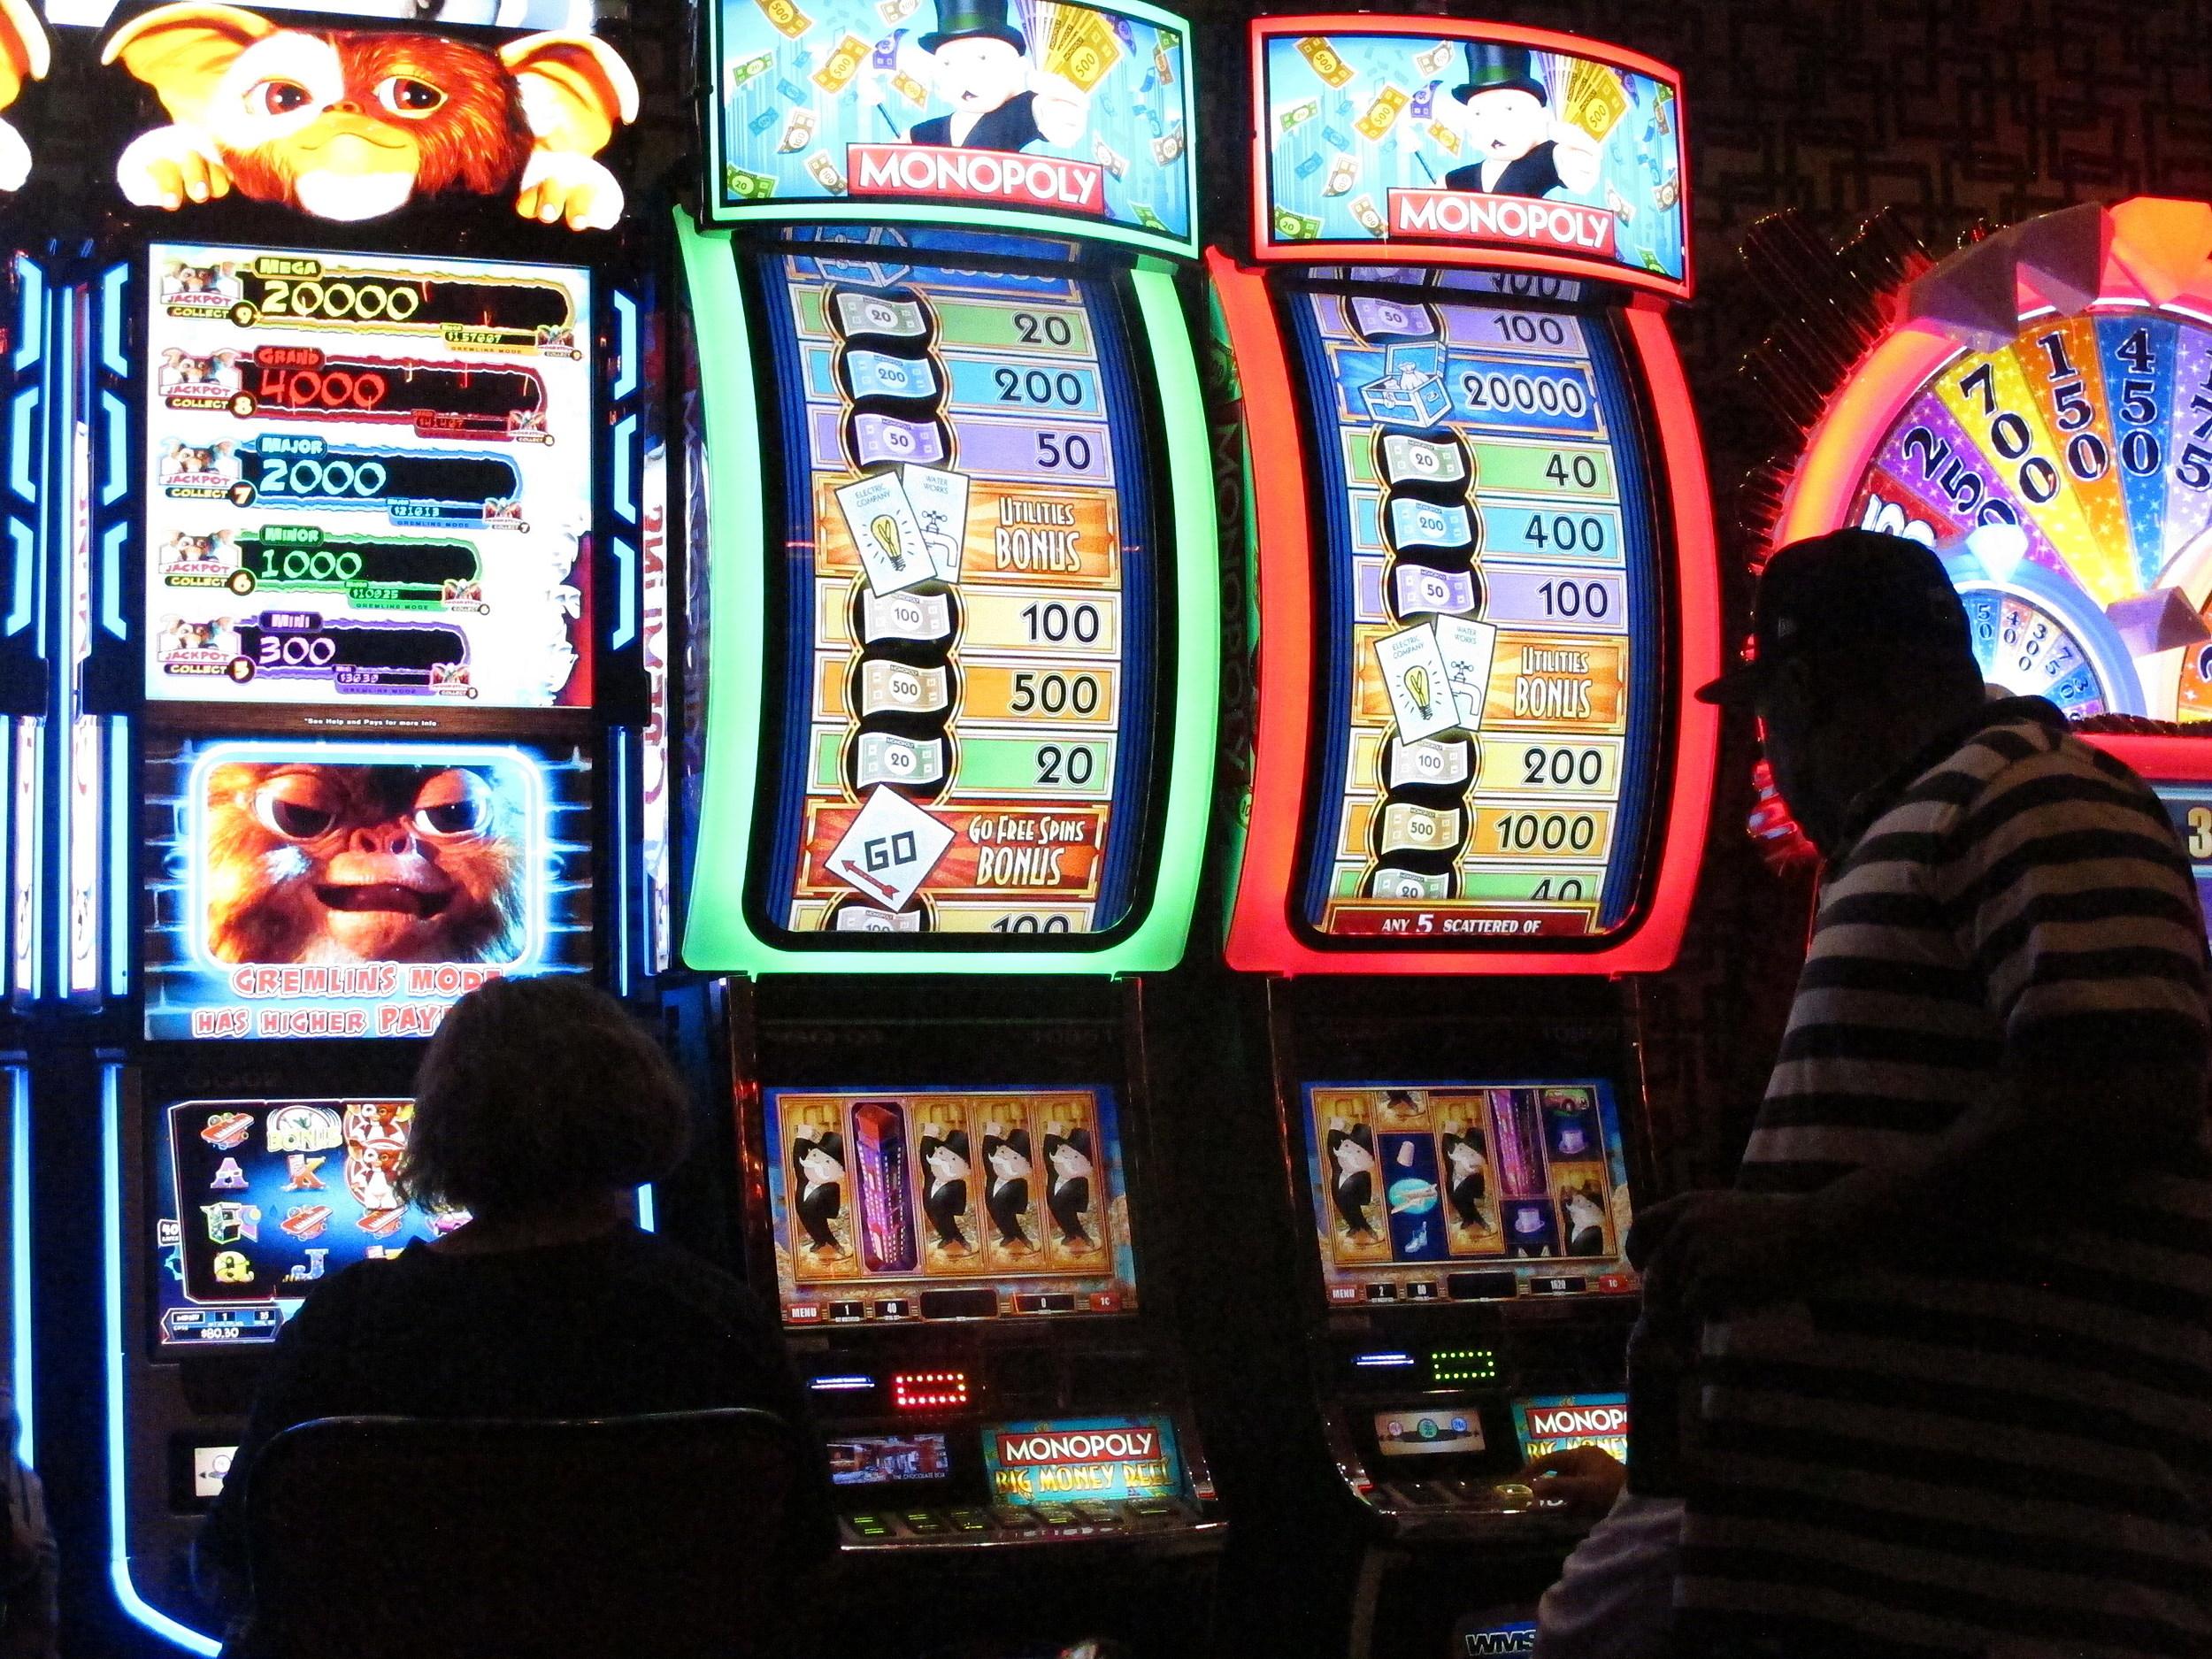 Atlantic city casino slot machines port aransas gambling boats